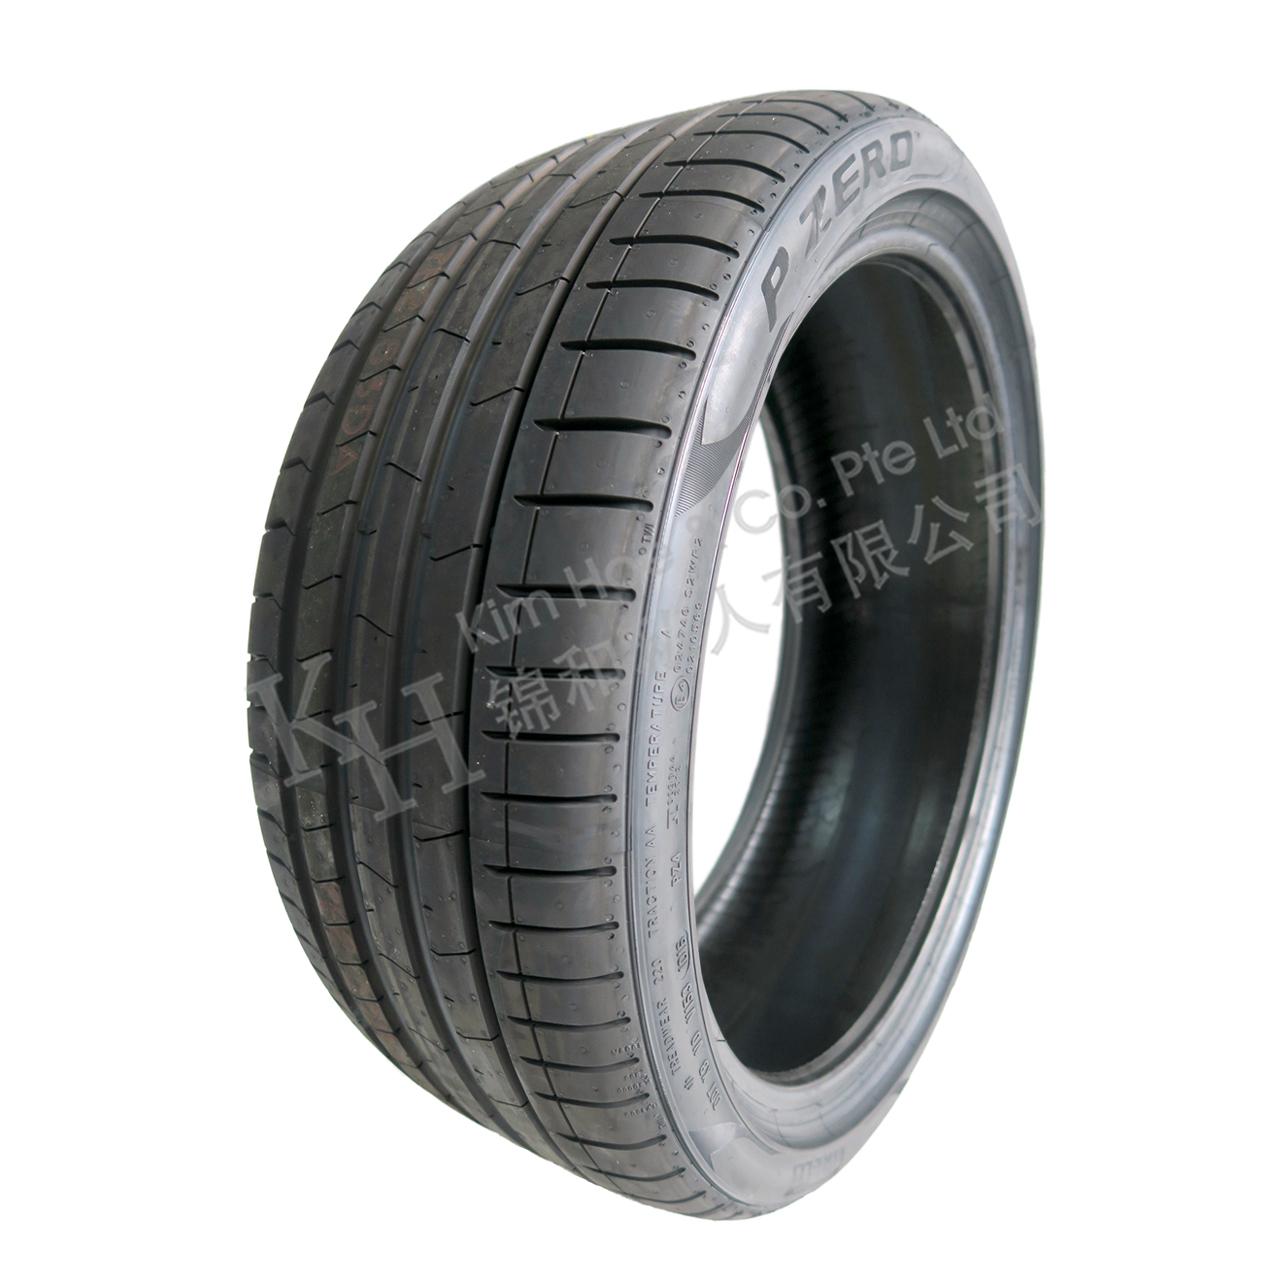 http://kimhoeco.com/wp-content/uploads/2016/10/pirelli-new-comfort-pzero.jpg